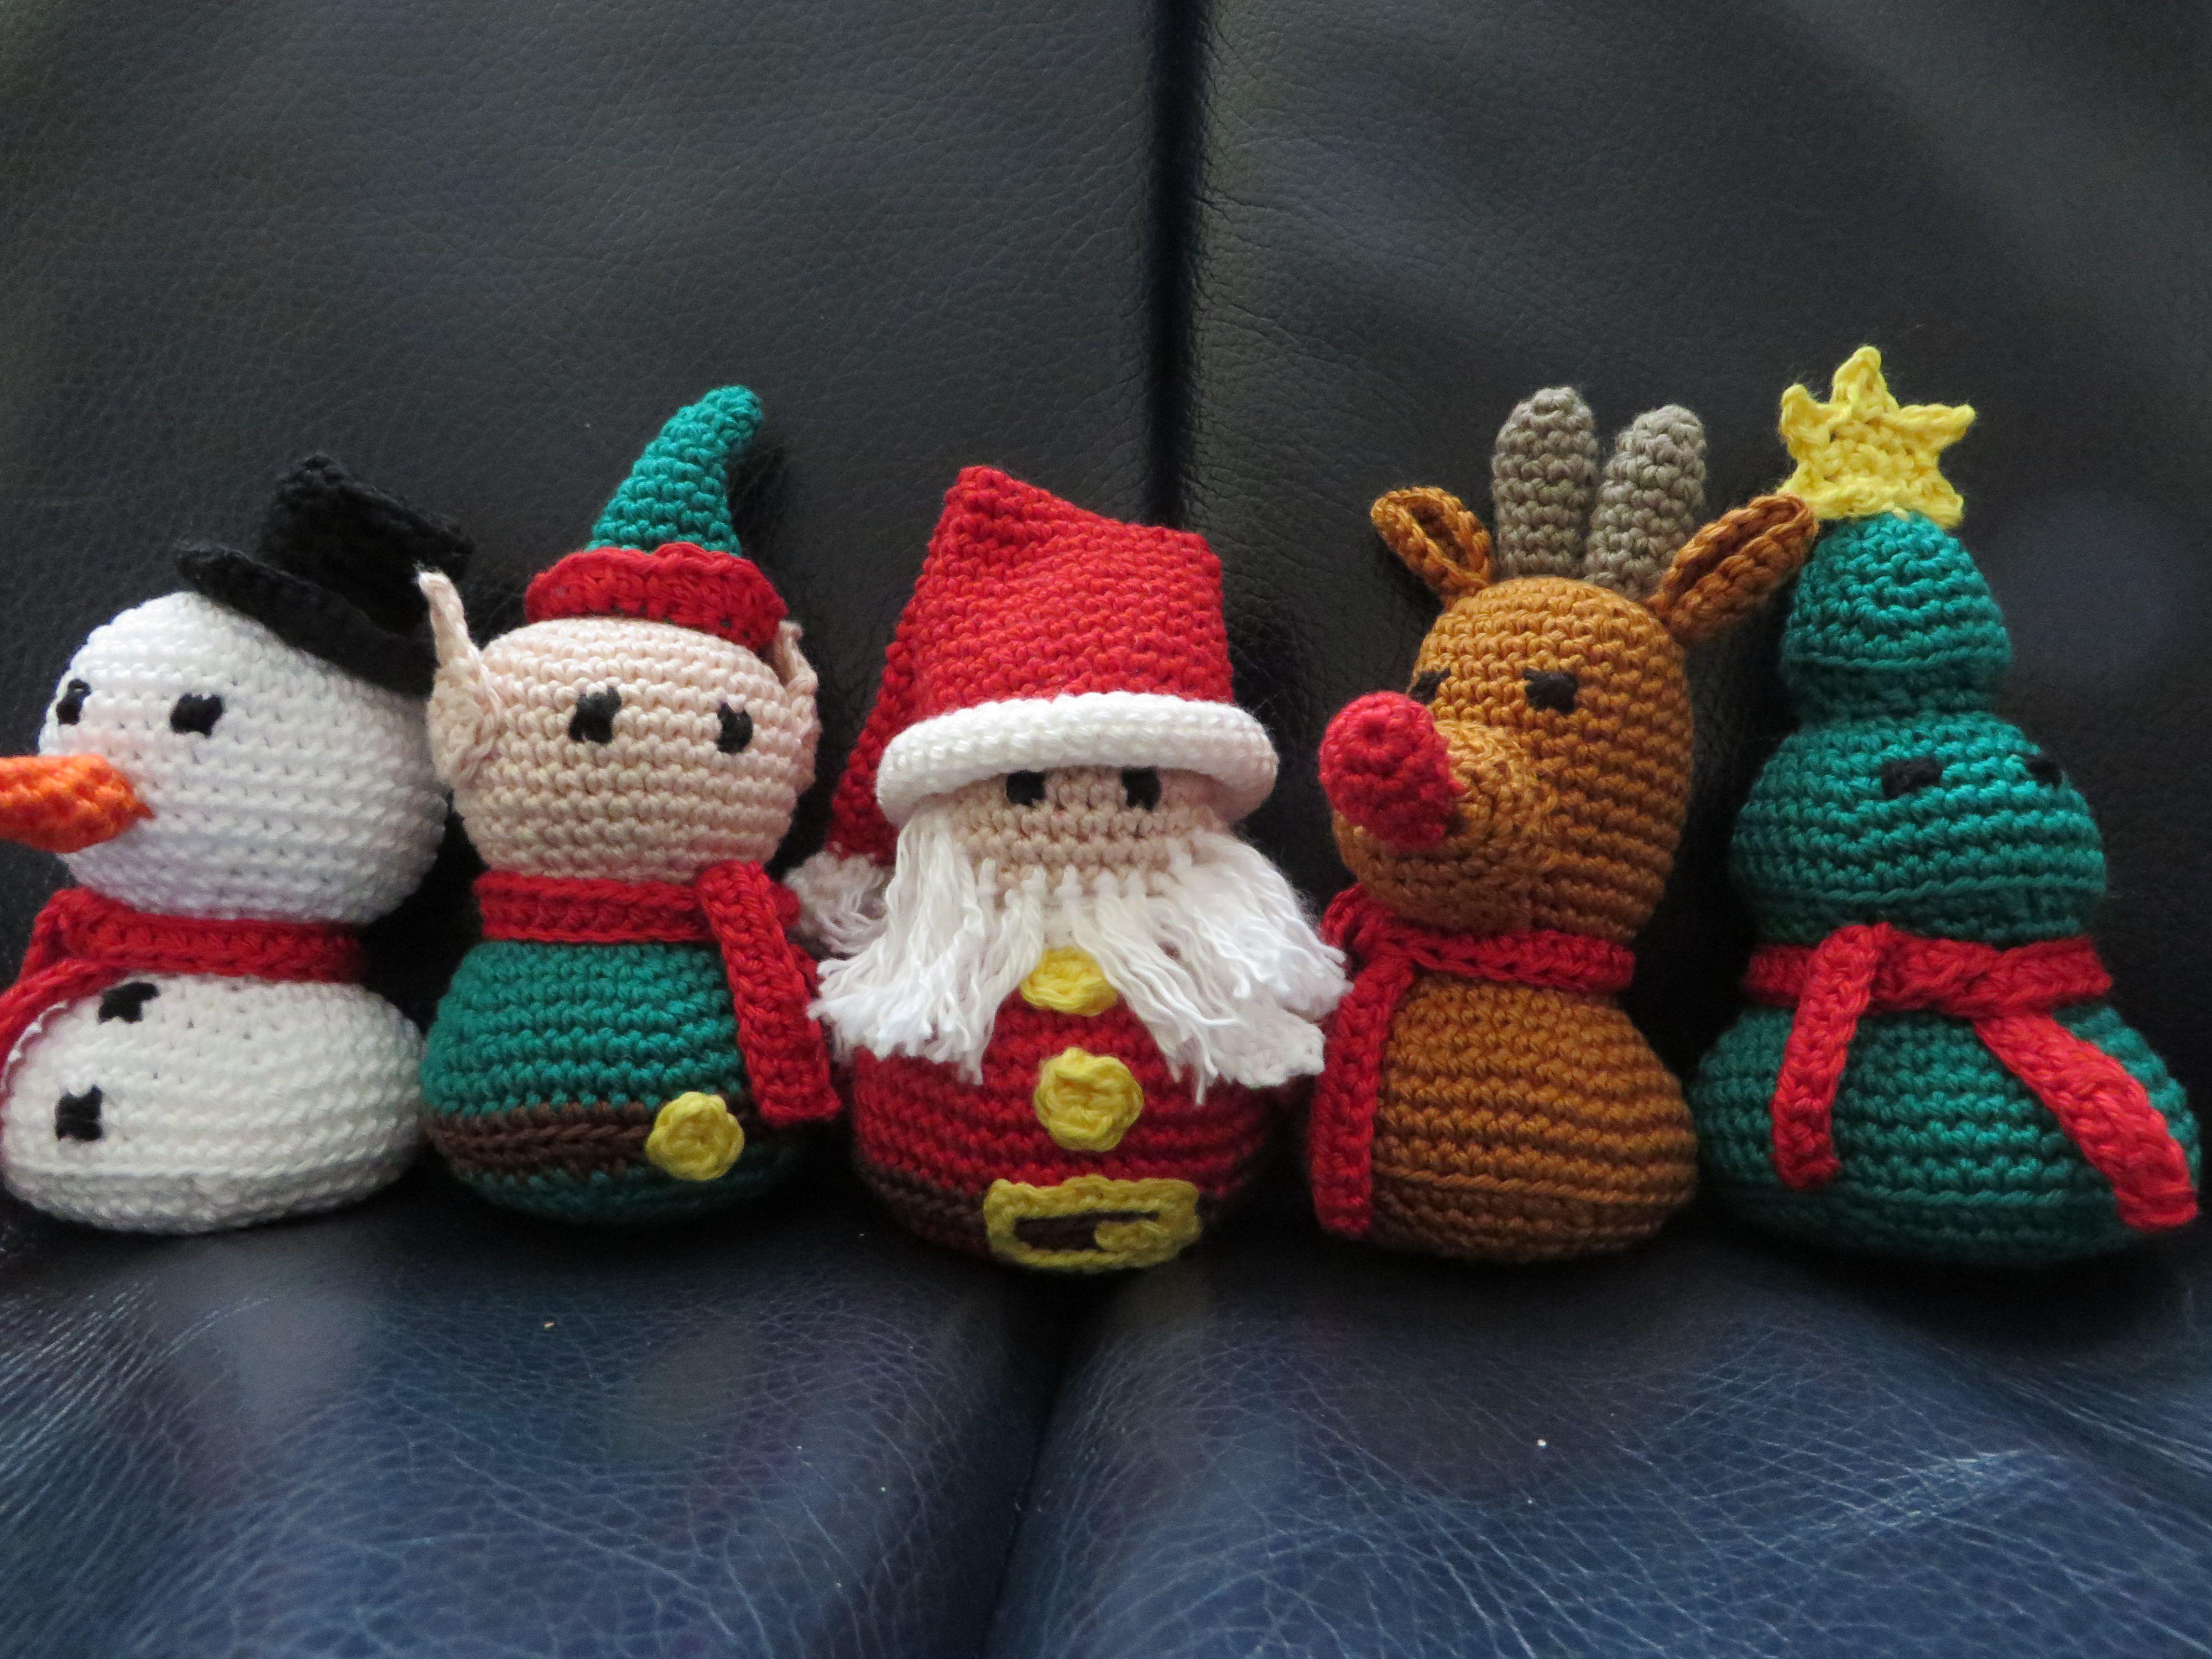 Kerstmini's van Dendennis